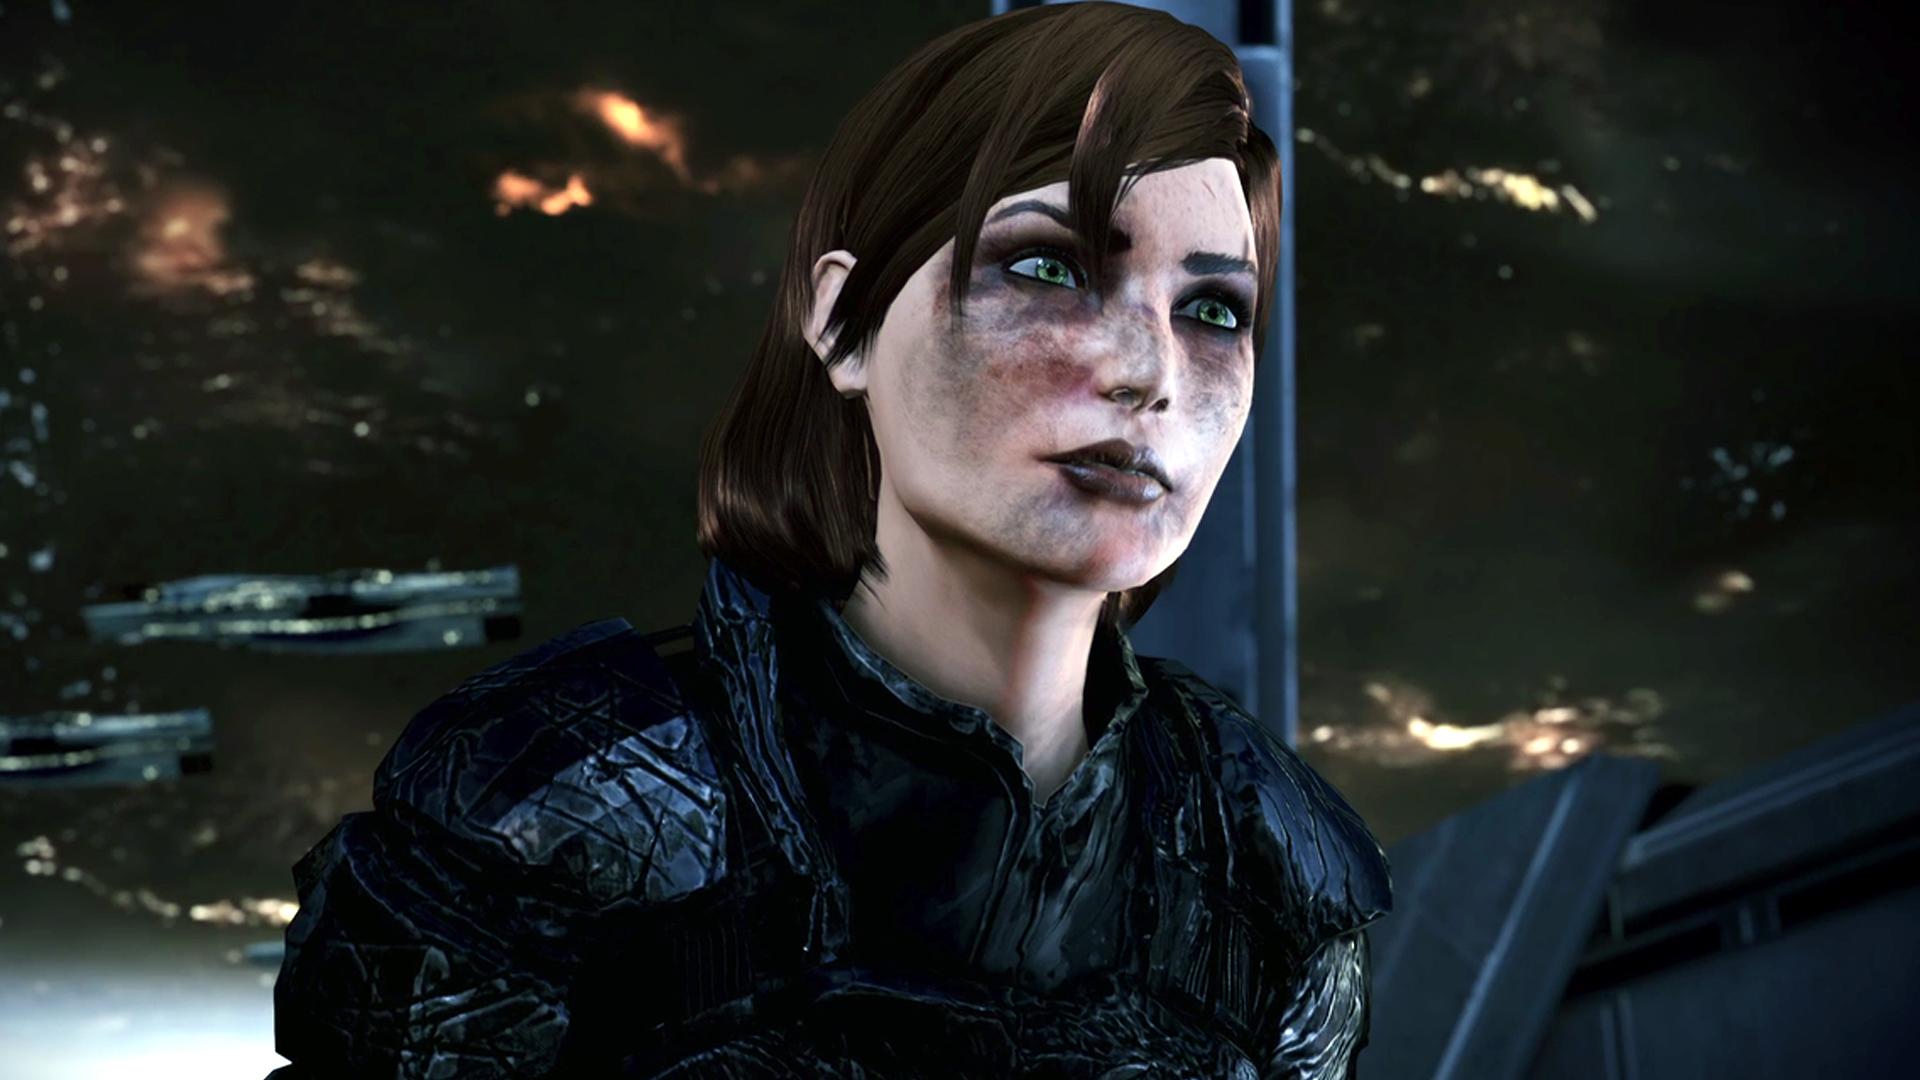 Mass Effect 3's original ending had a Reaper Queen rather than the Catalyst